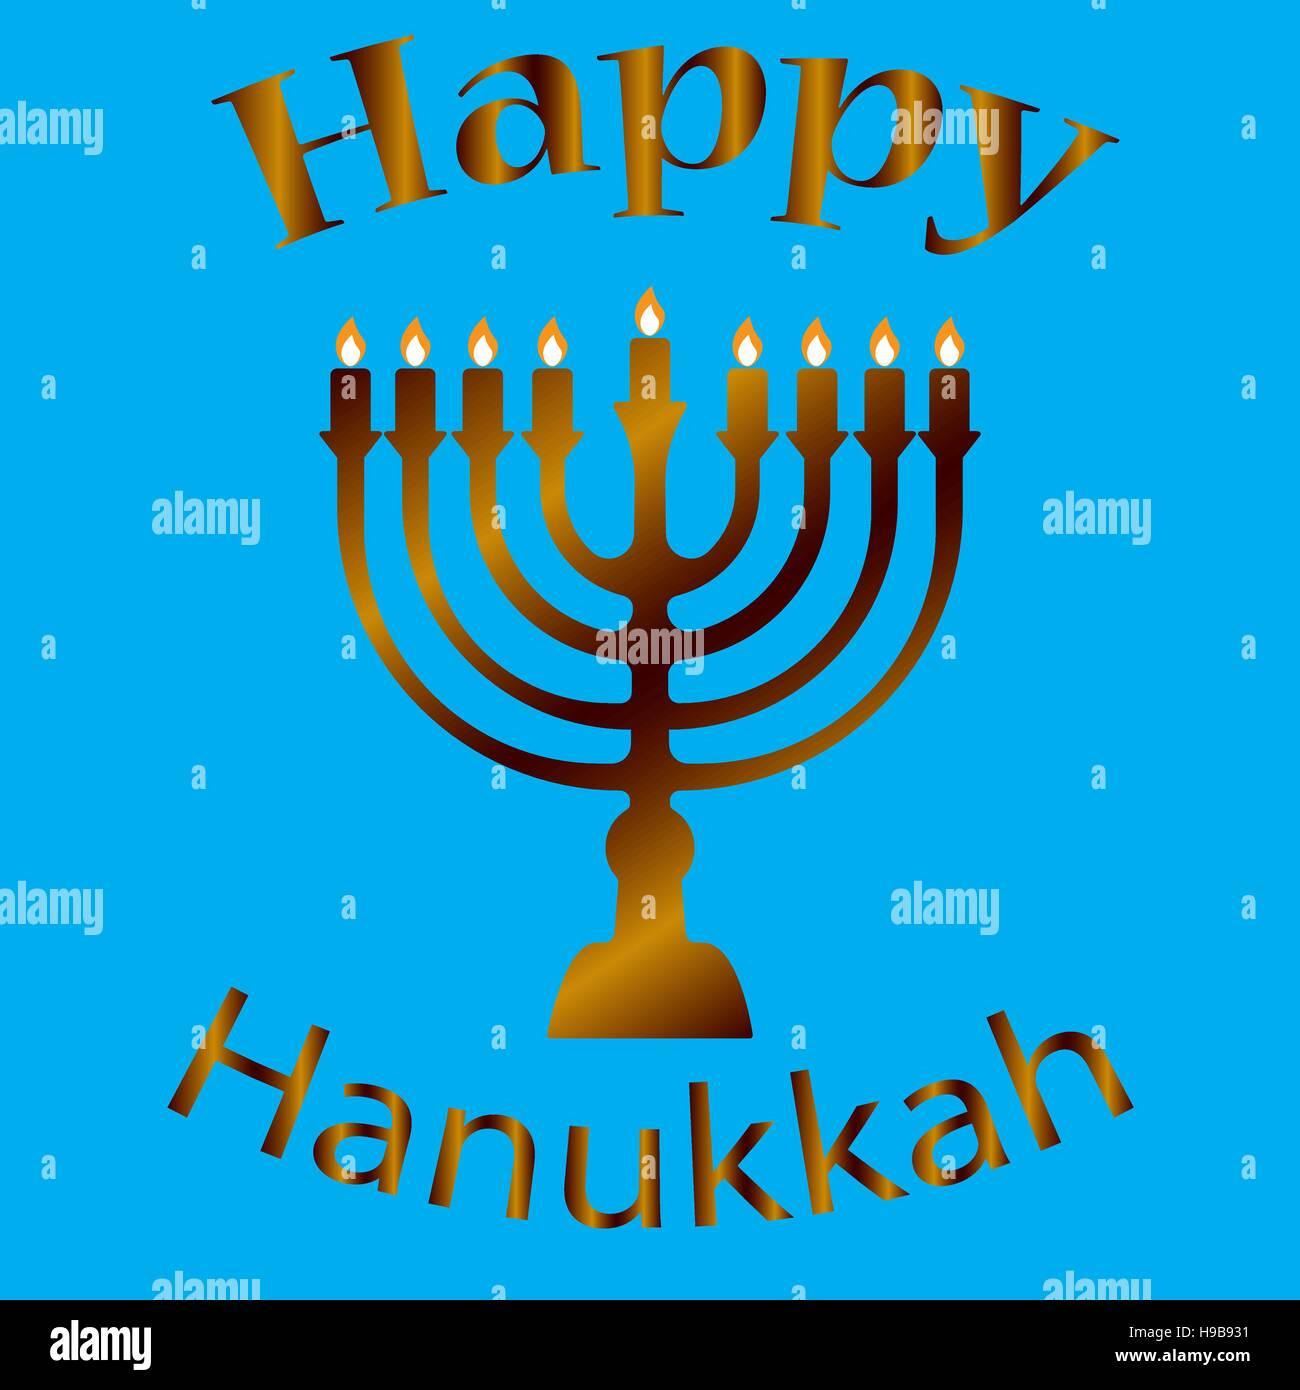 Hanukkah Typographic Vector Design - Happy Hanukkah. Jewish holiday. Hanukkah Menorah on Light Blue Background - Stock Vector